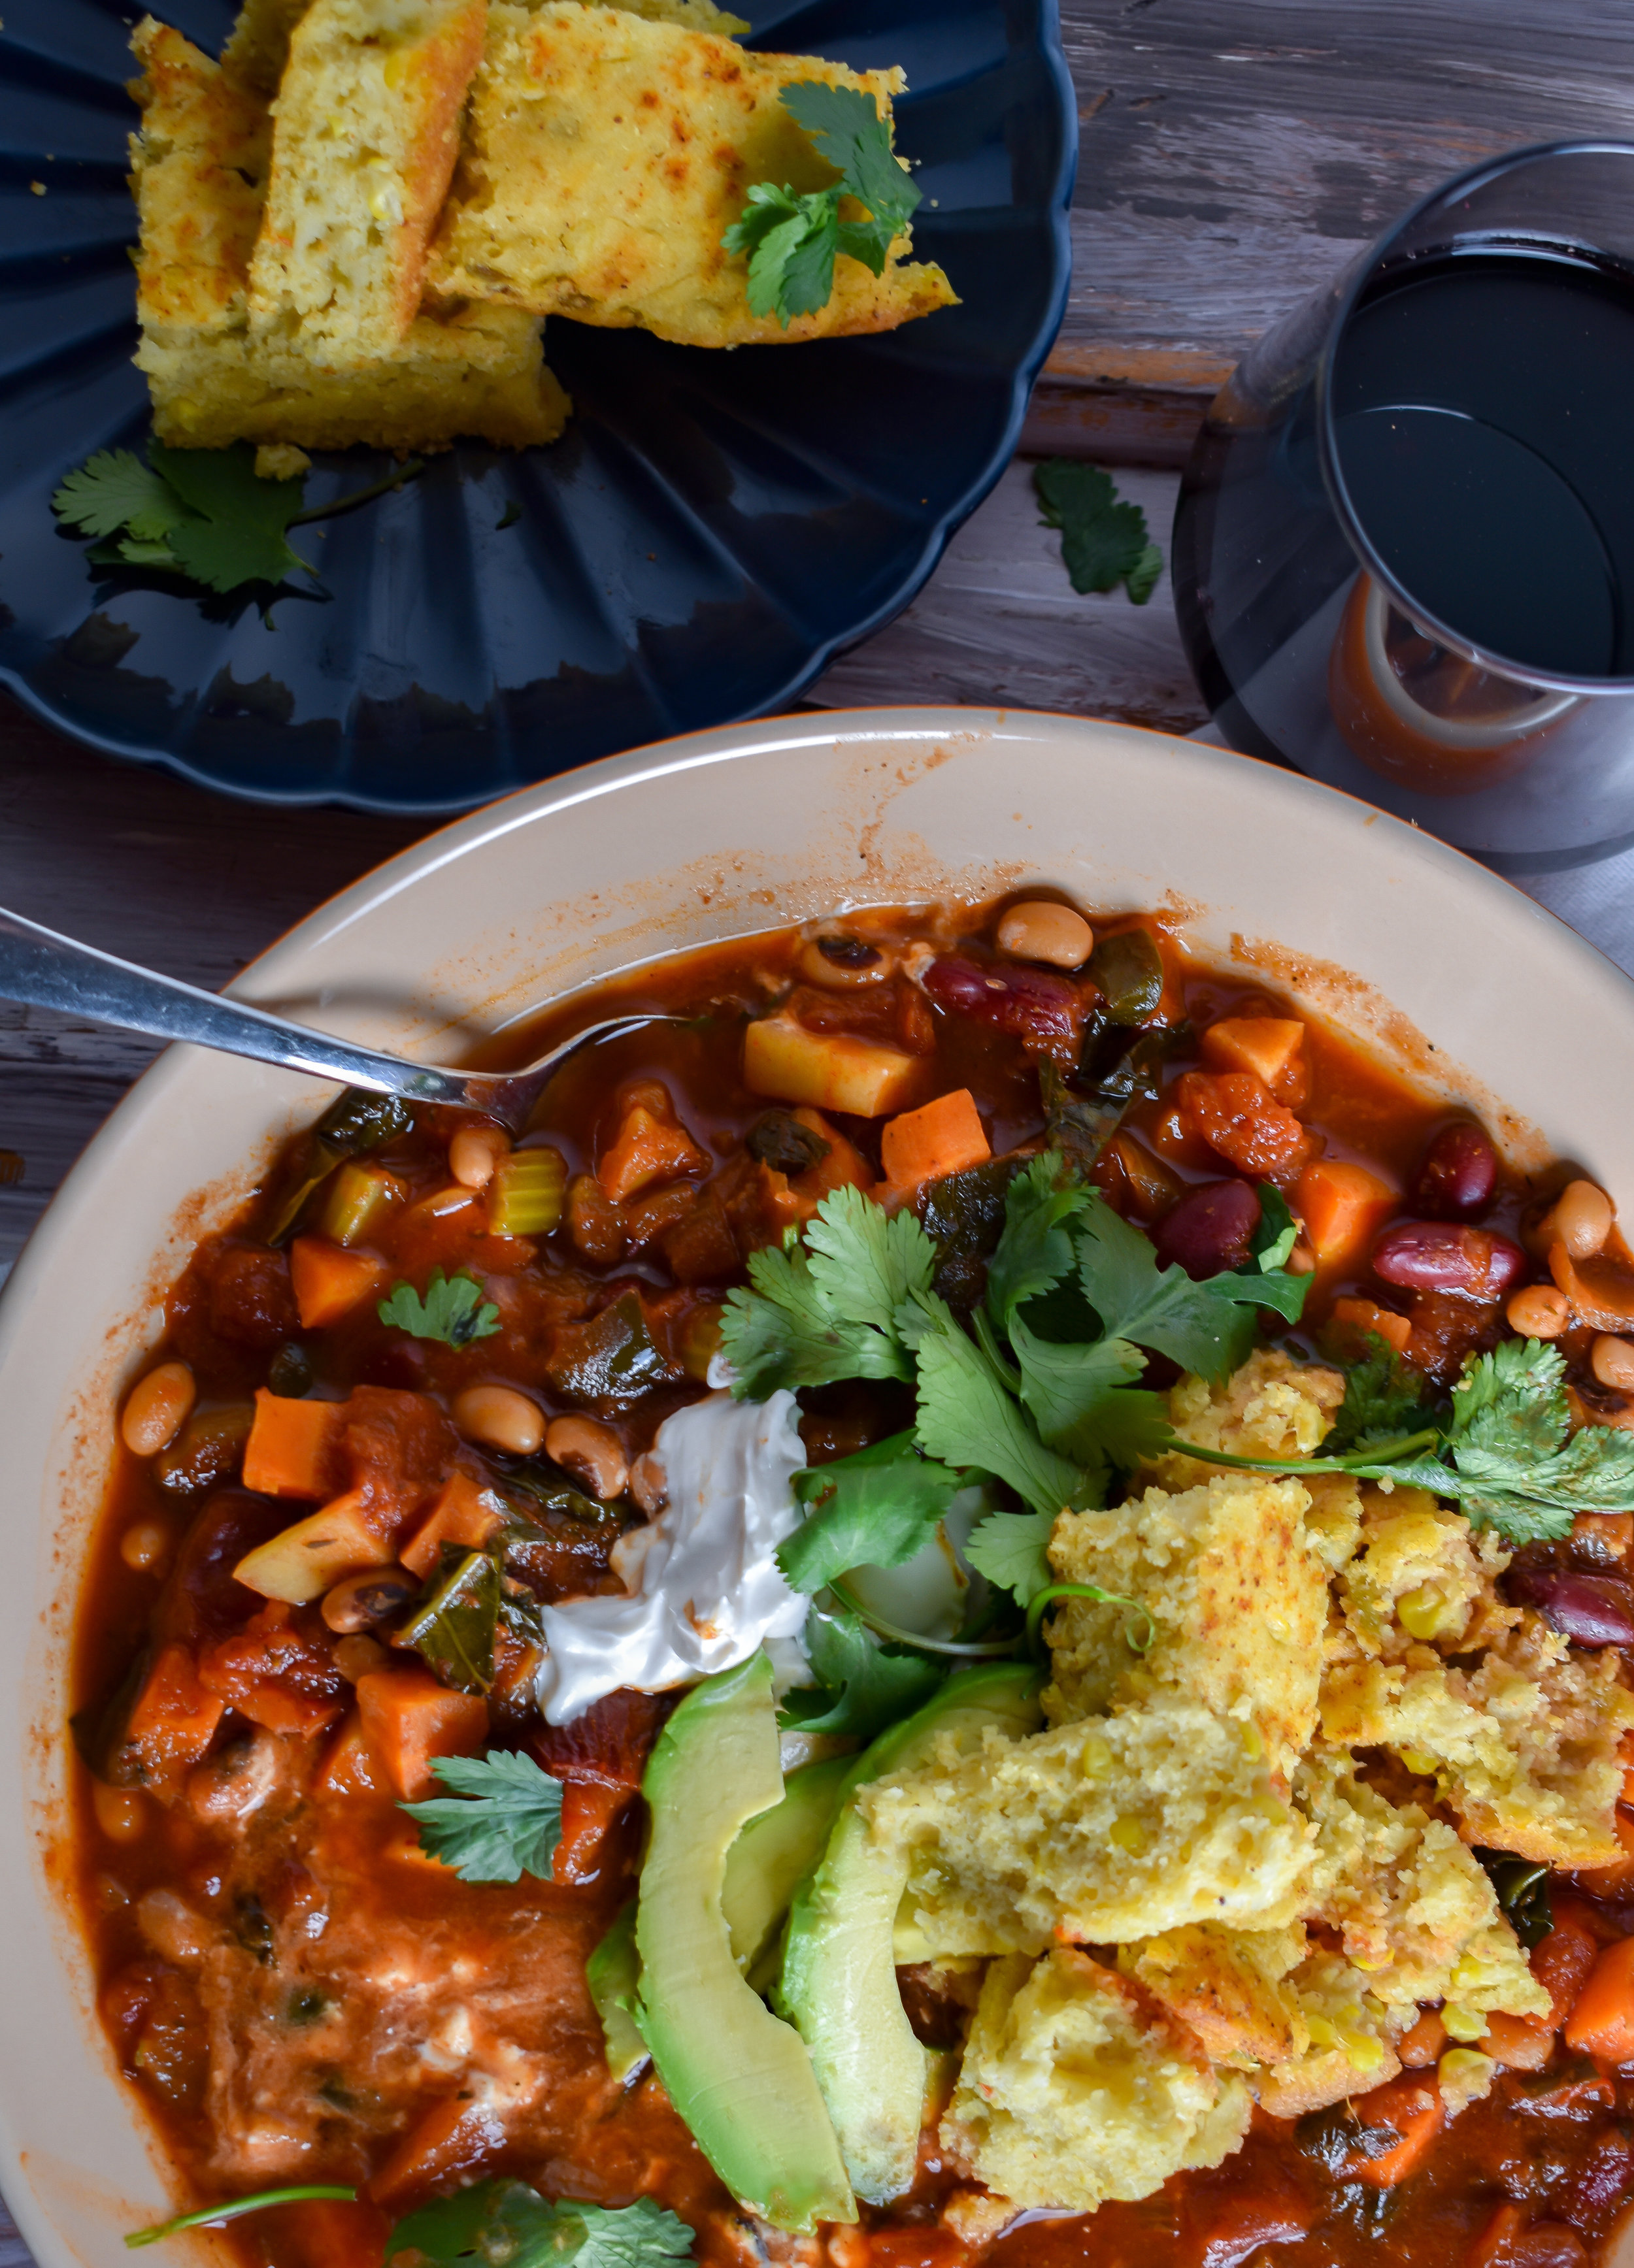 7. When the chili is done, serve in a bowl with cornbread. I like to add some vegan sour cream, avocado, cilantro, and cornbread with mine!